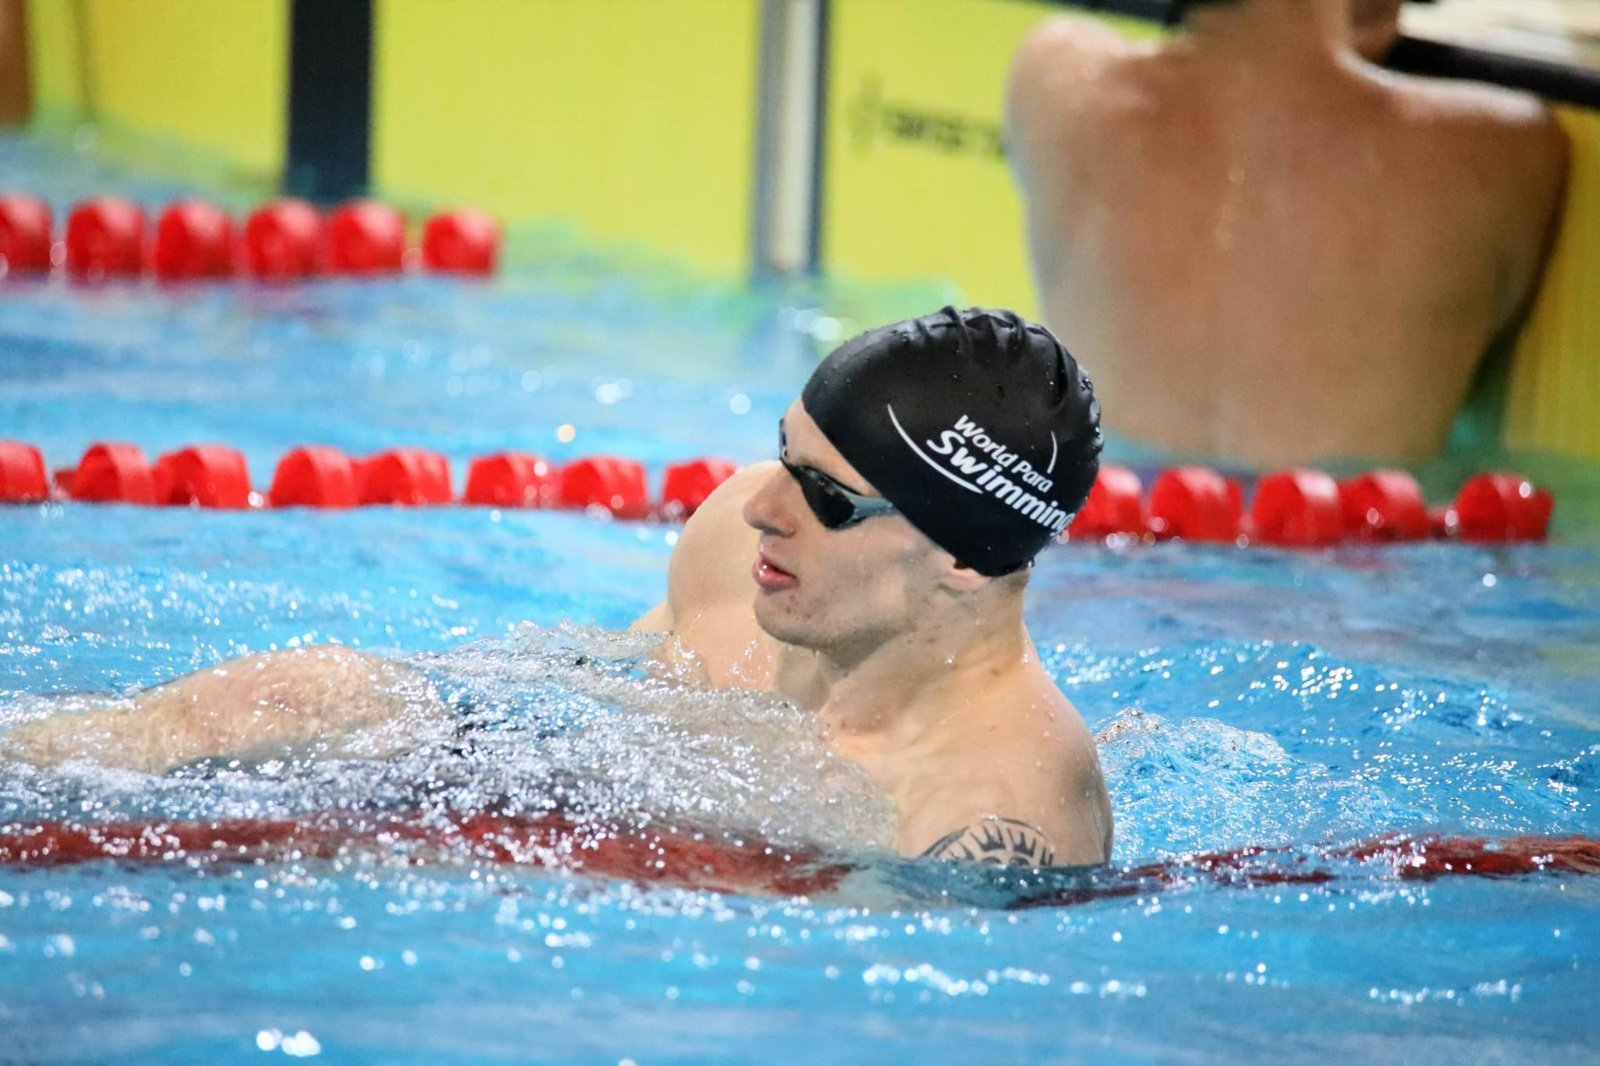 Lietuvos paralimpietis Edgaras Matakas – triskart Europos čempionas